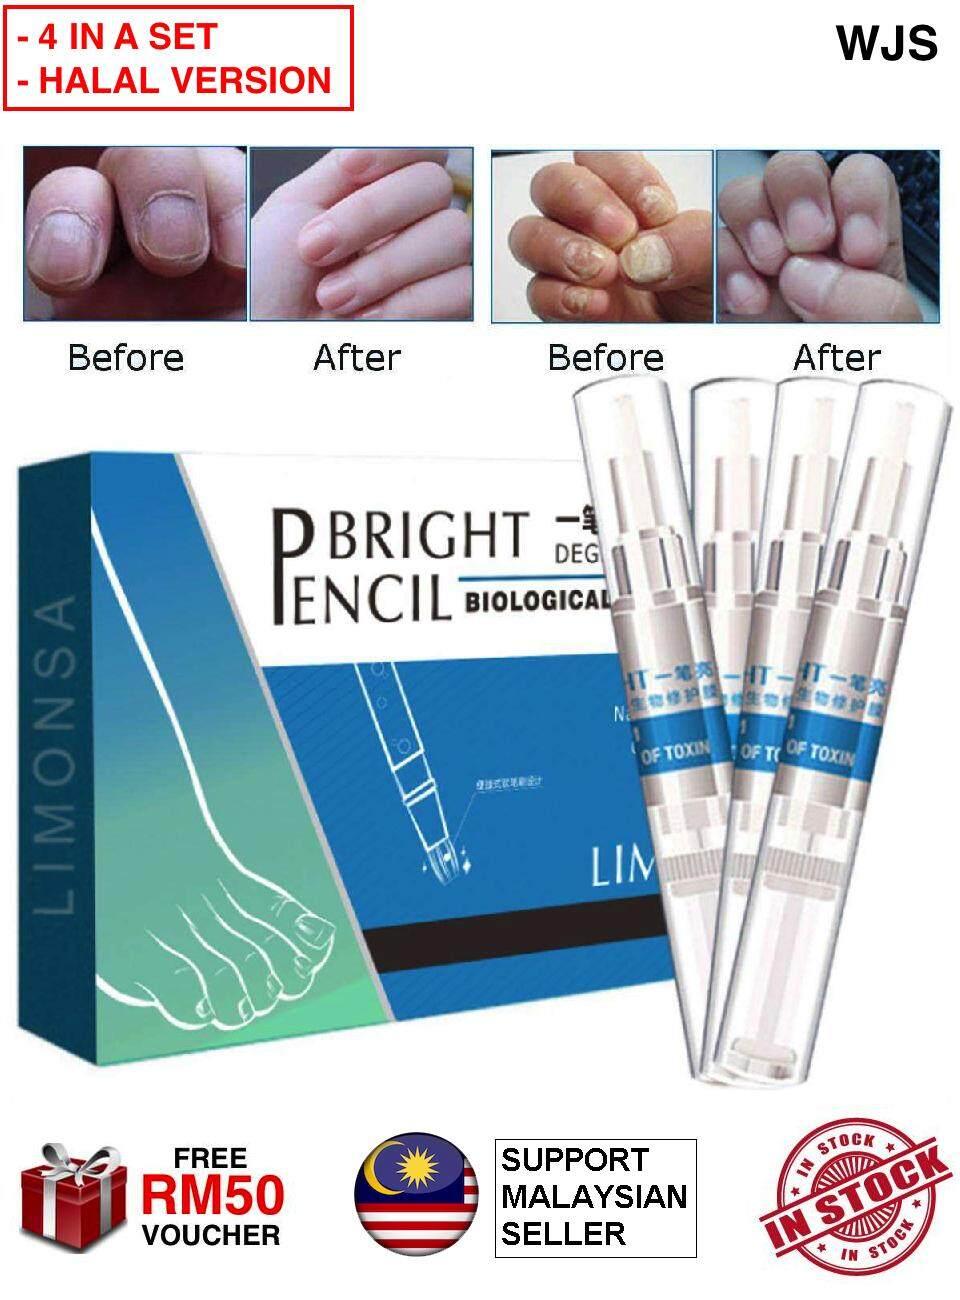 (HALAL VERSION) WJS Halal 4pcs 4 pcs Bright Pencil Nail Fungal Treatment Anti Fungus Biological Nail Repair Solution Fingernail Treatment Toenail Treatment 3ml [FREE RM50 VOUCHER]